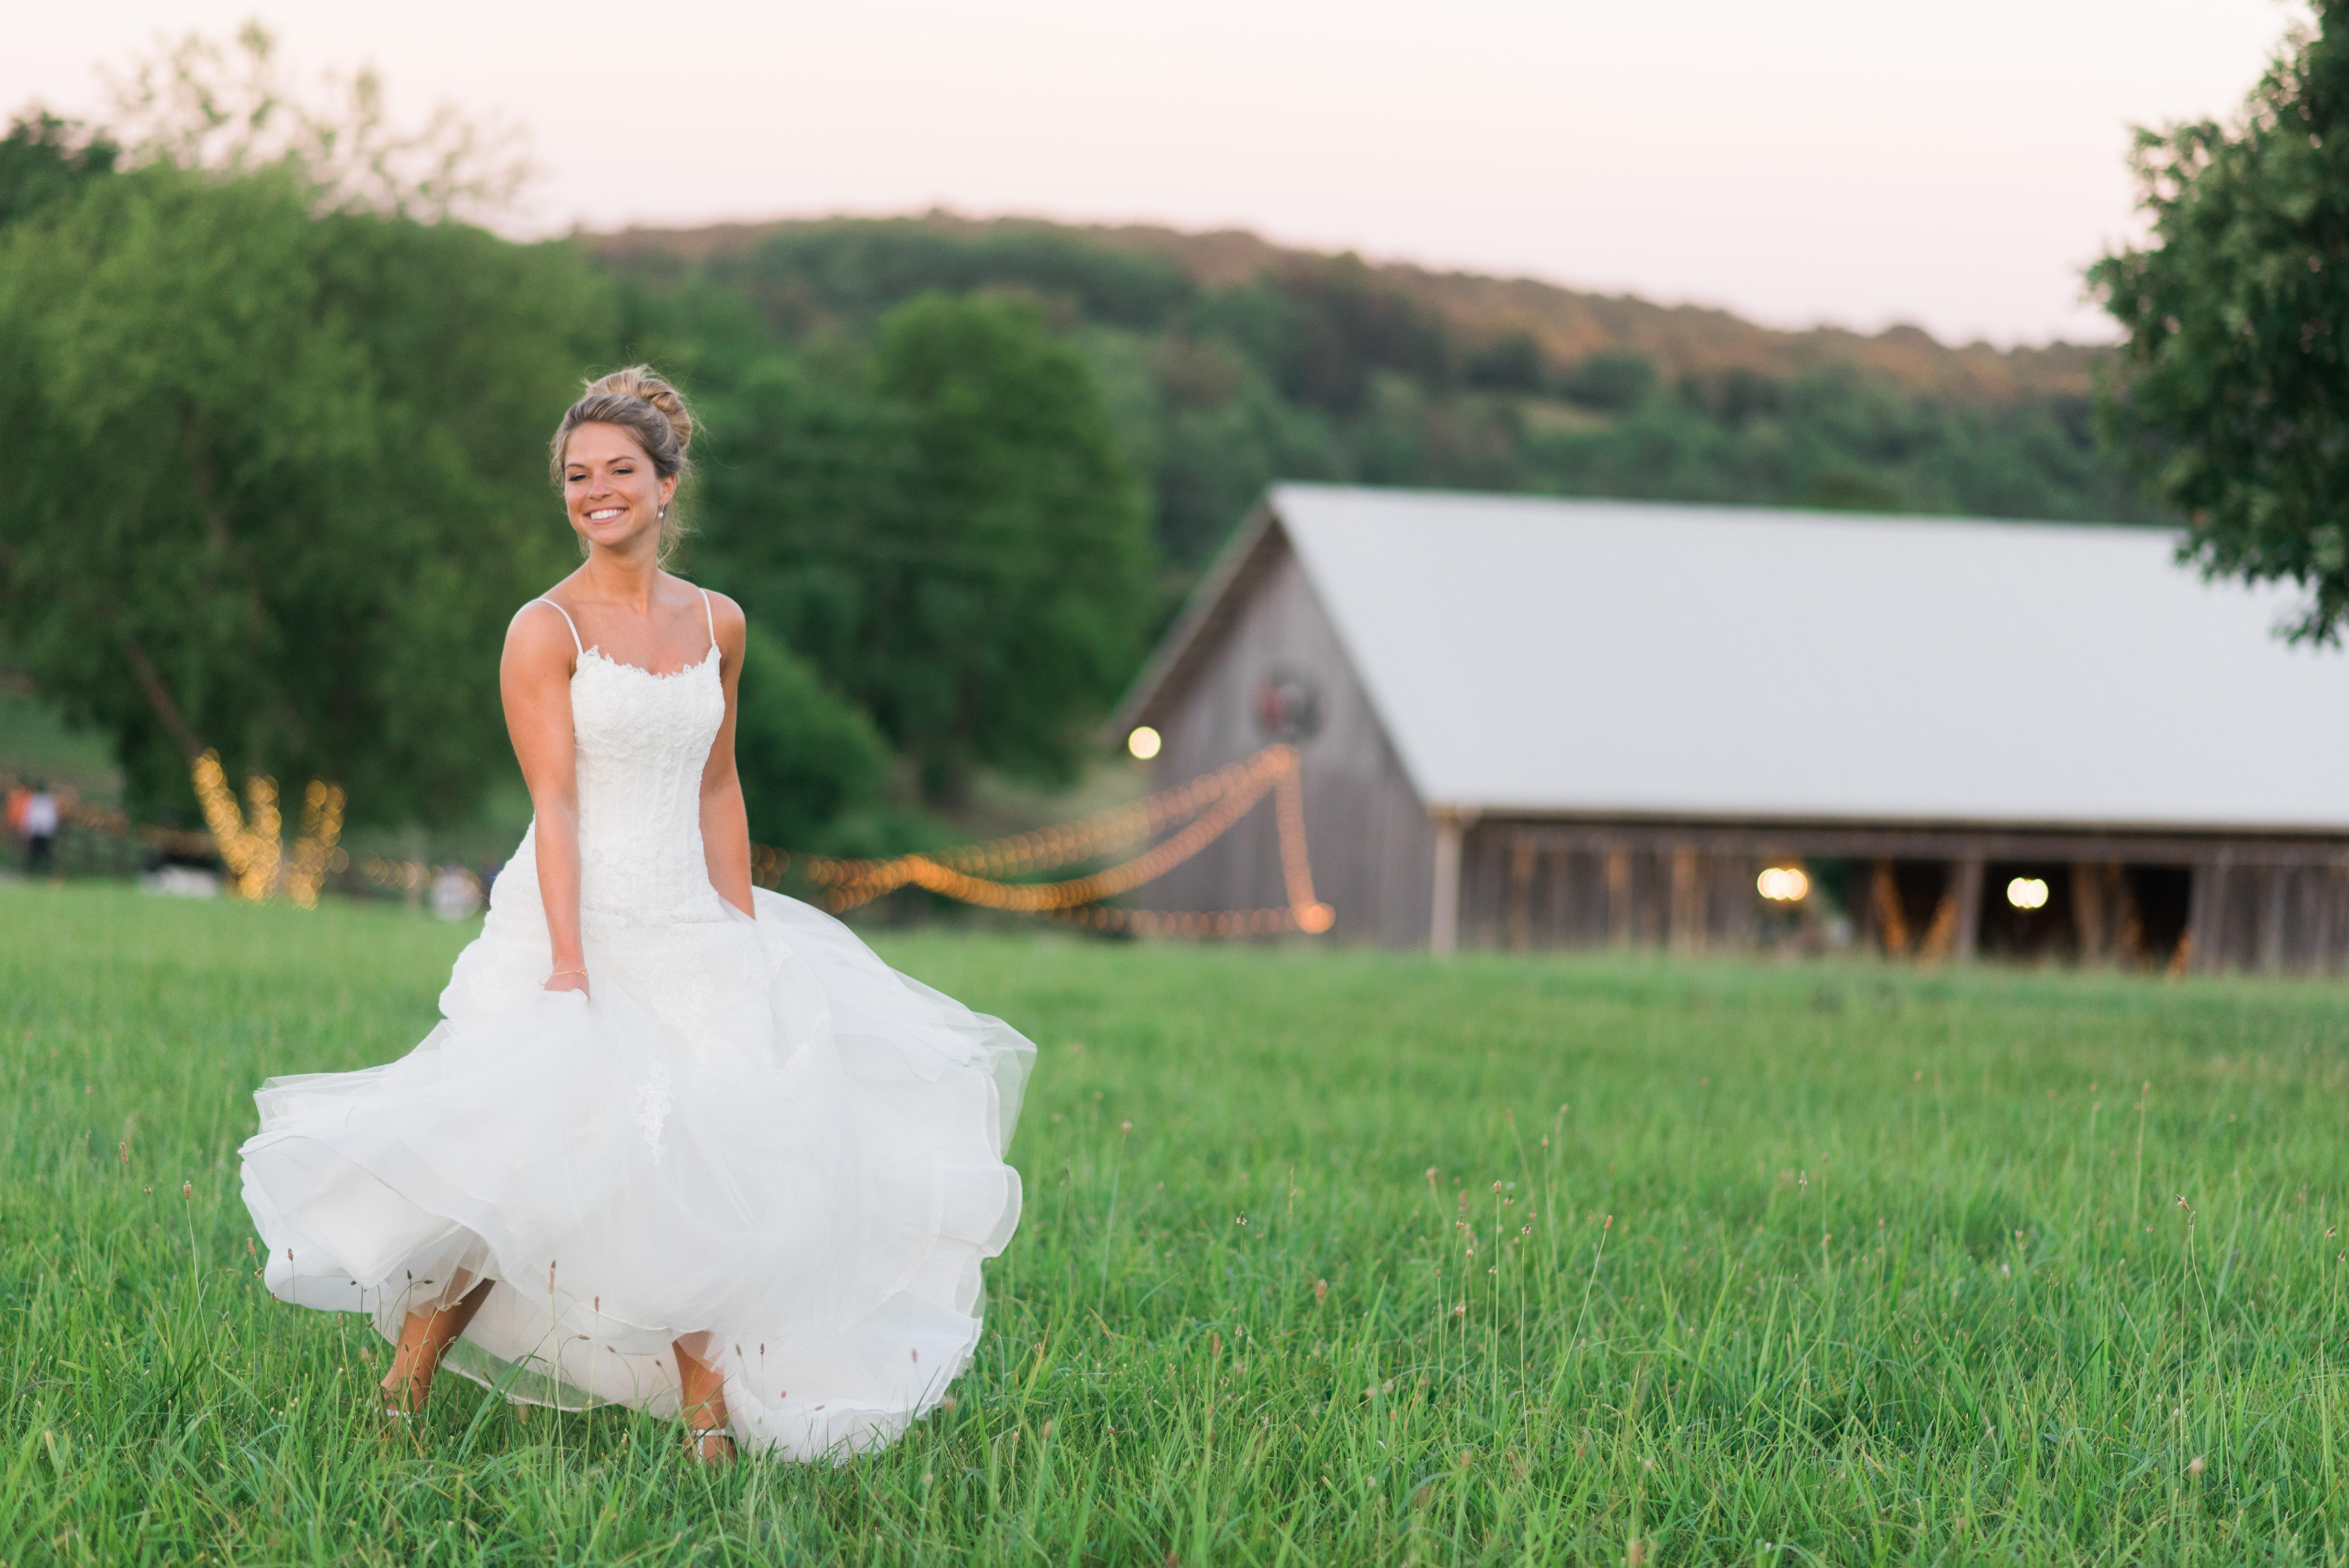 wedding201606110680